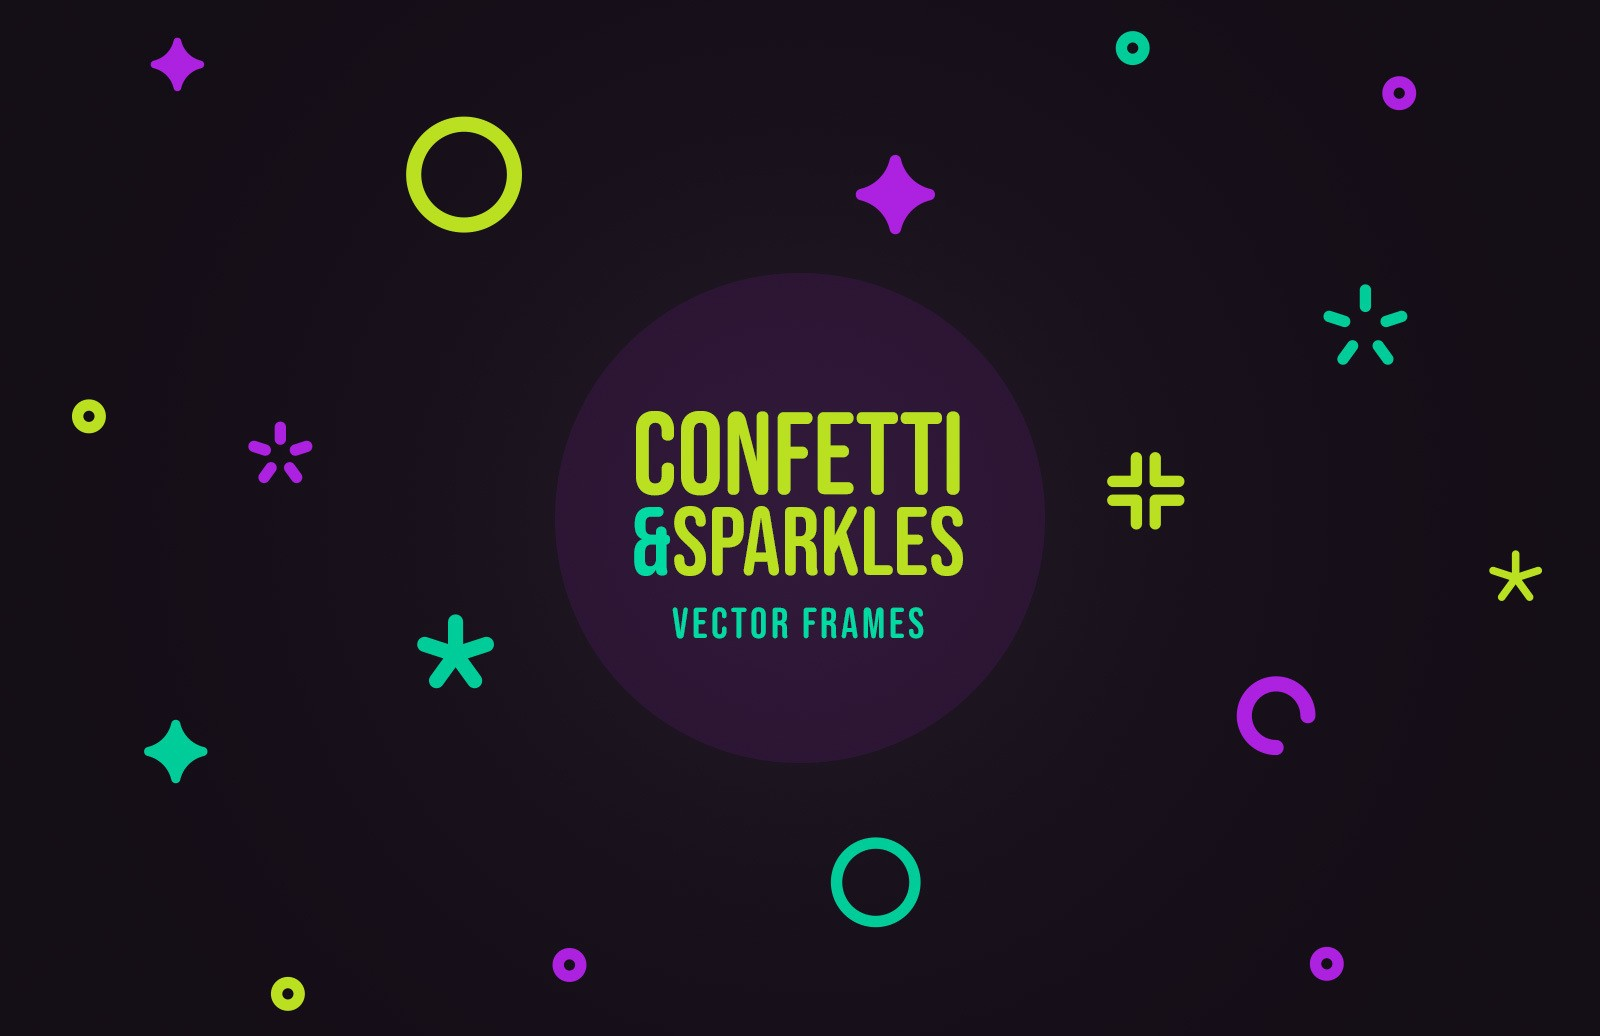 Confetti & Sparkles Vector Frames